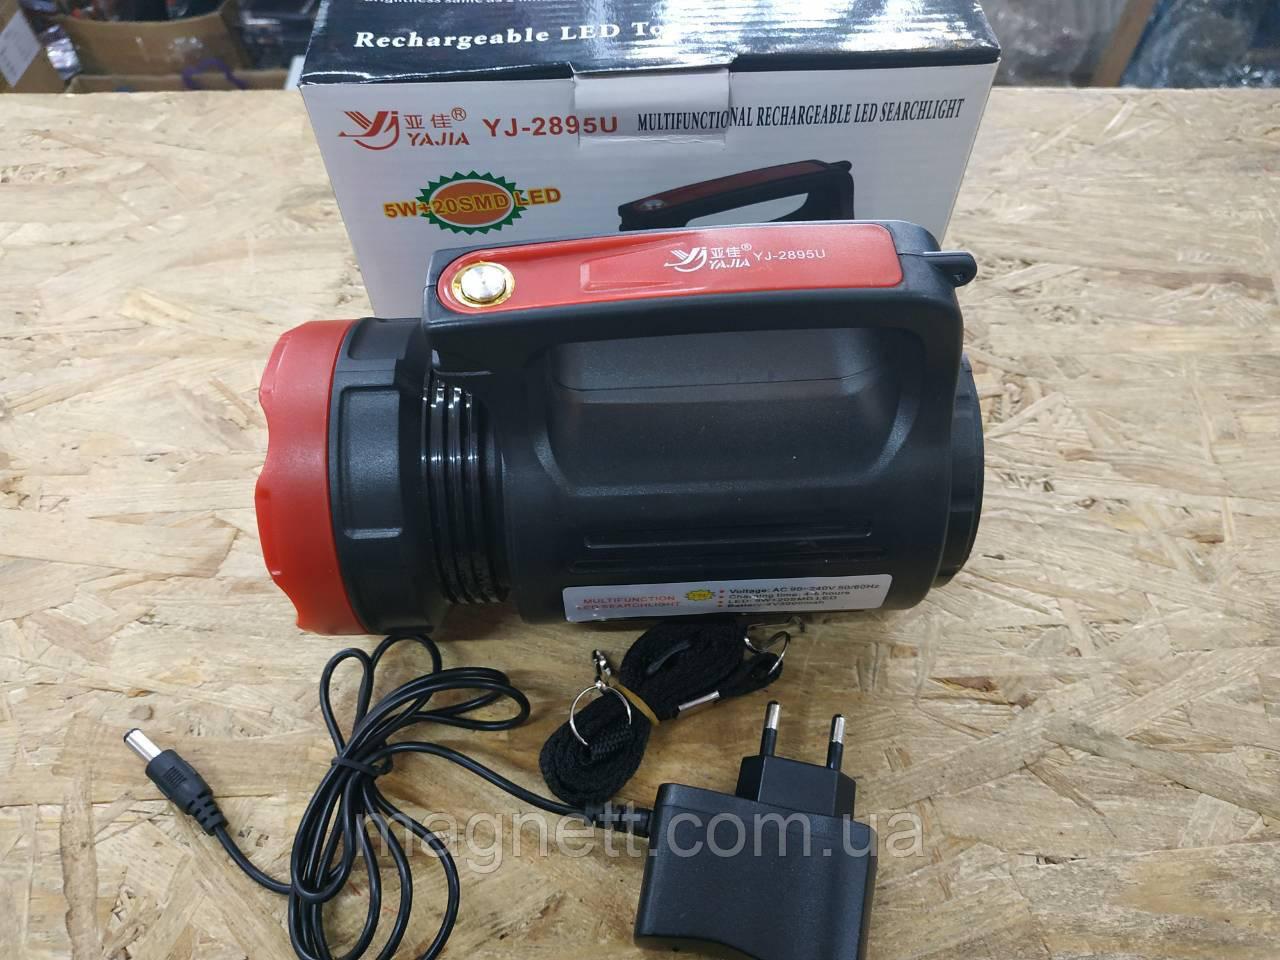 Аккумуляторный ручной фонарь Yajia YJ-2895